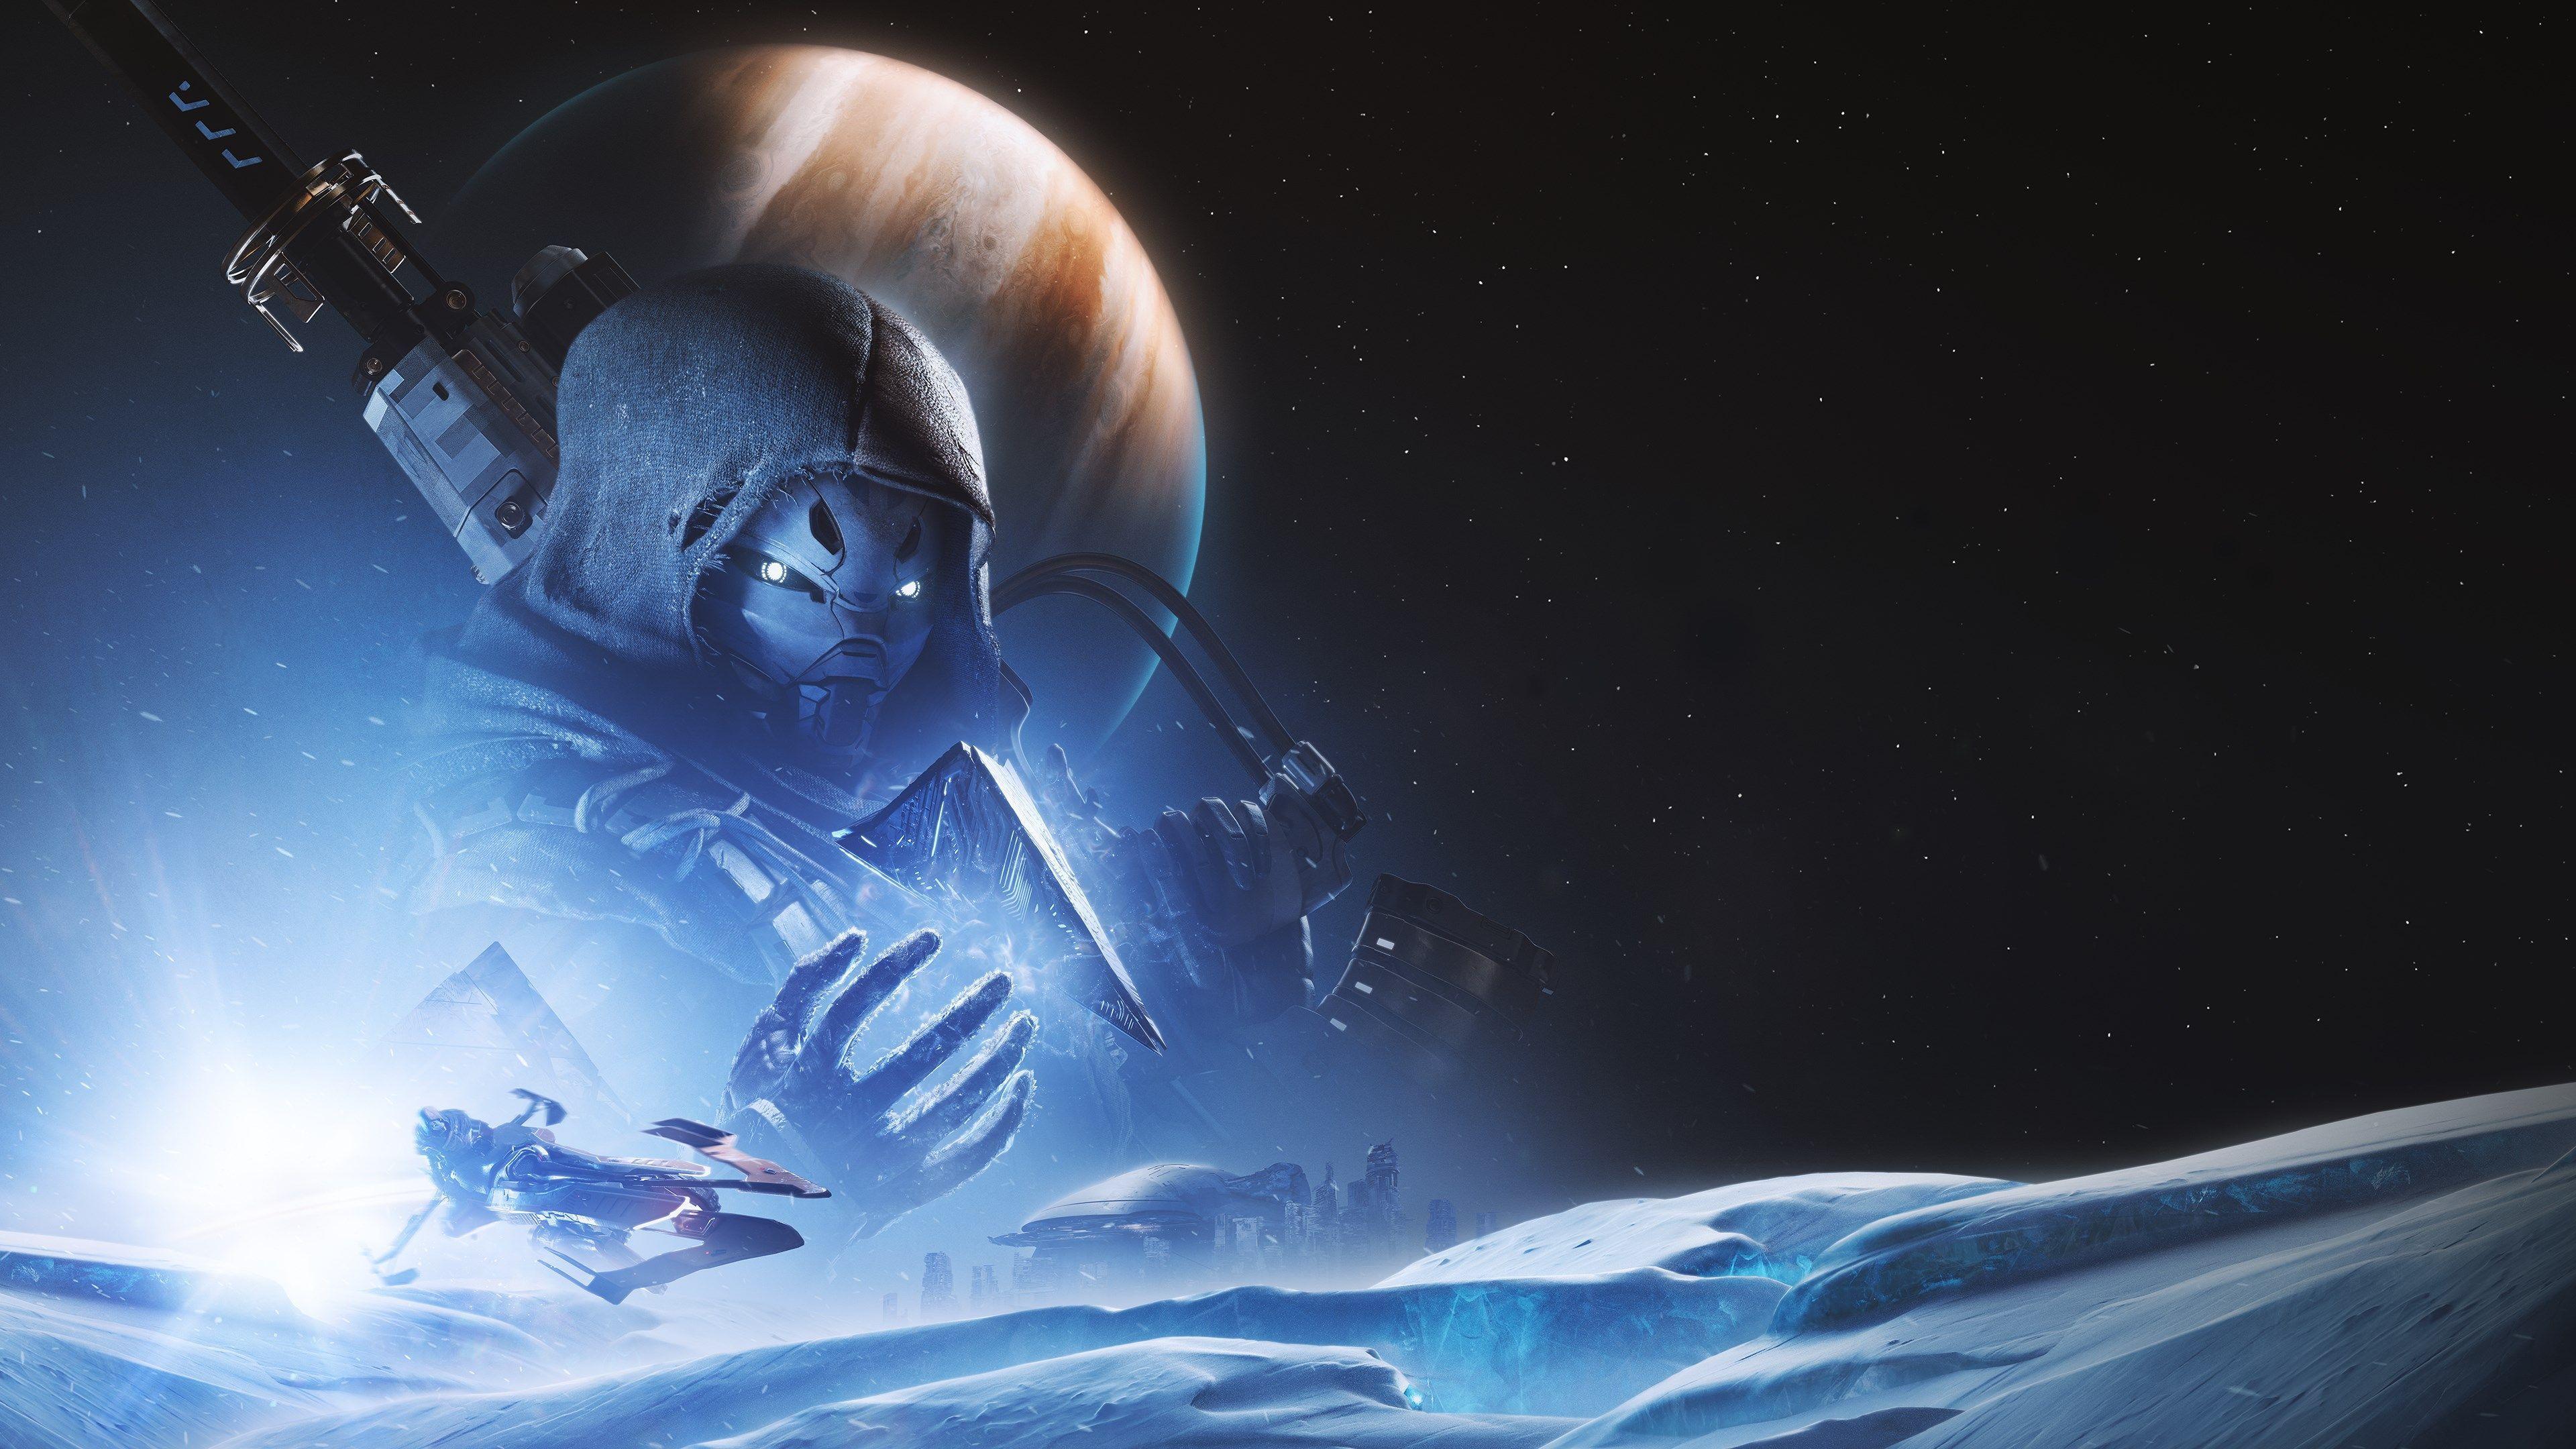 Destiny 2 Beyond Light Wallpapers - Top Free Destiny 2 Beyond Light  Backgrounds - WallpaperAccess